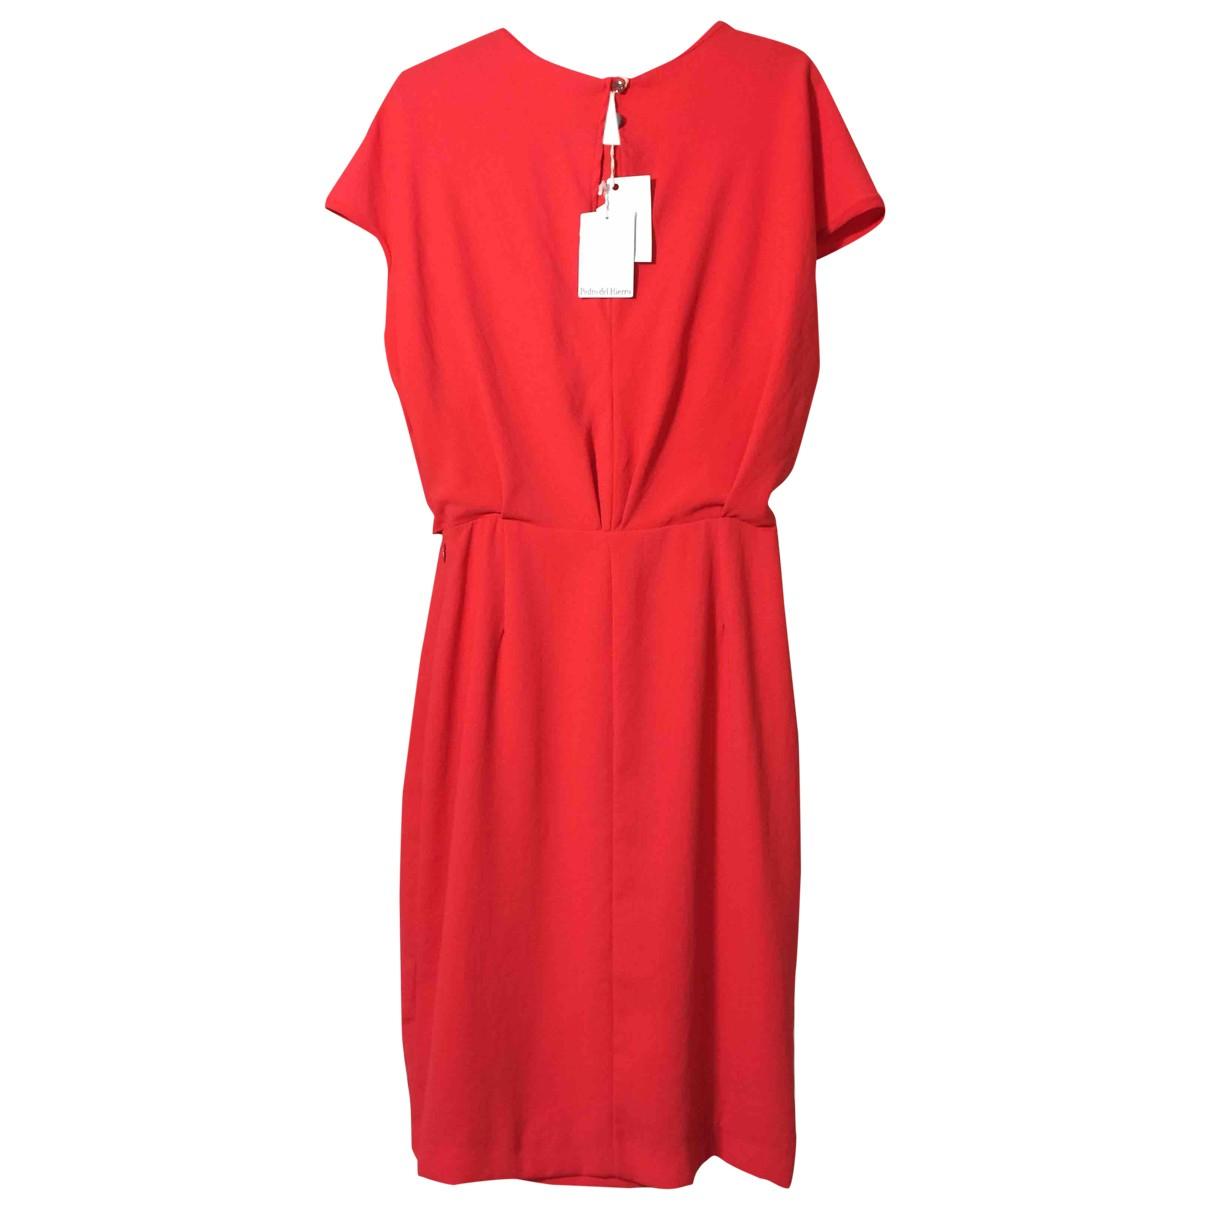 Pedro Del Hierro \N Red dress for Women 12 UK